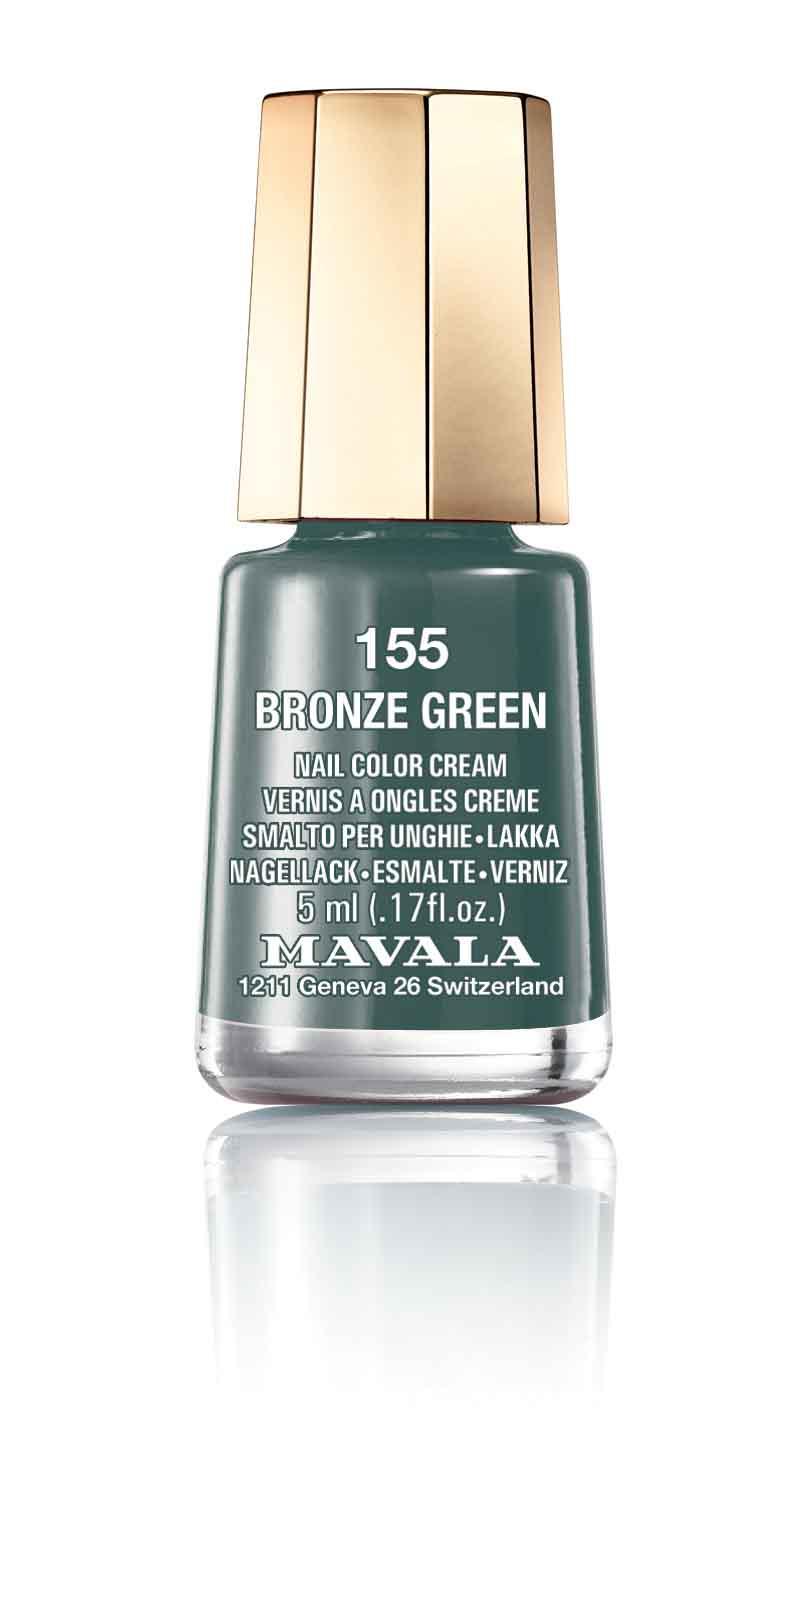 155 BRONZE GREEN